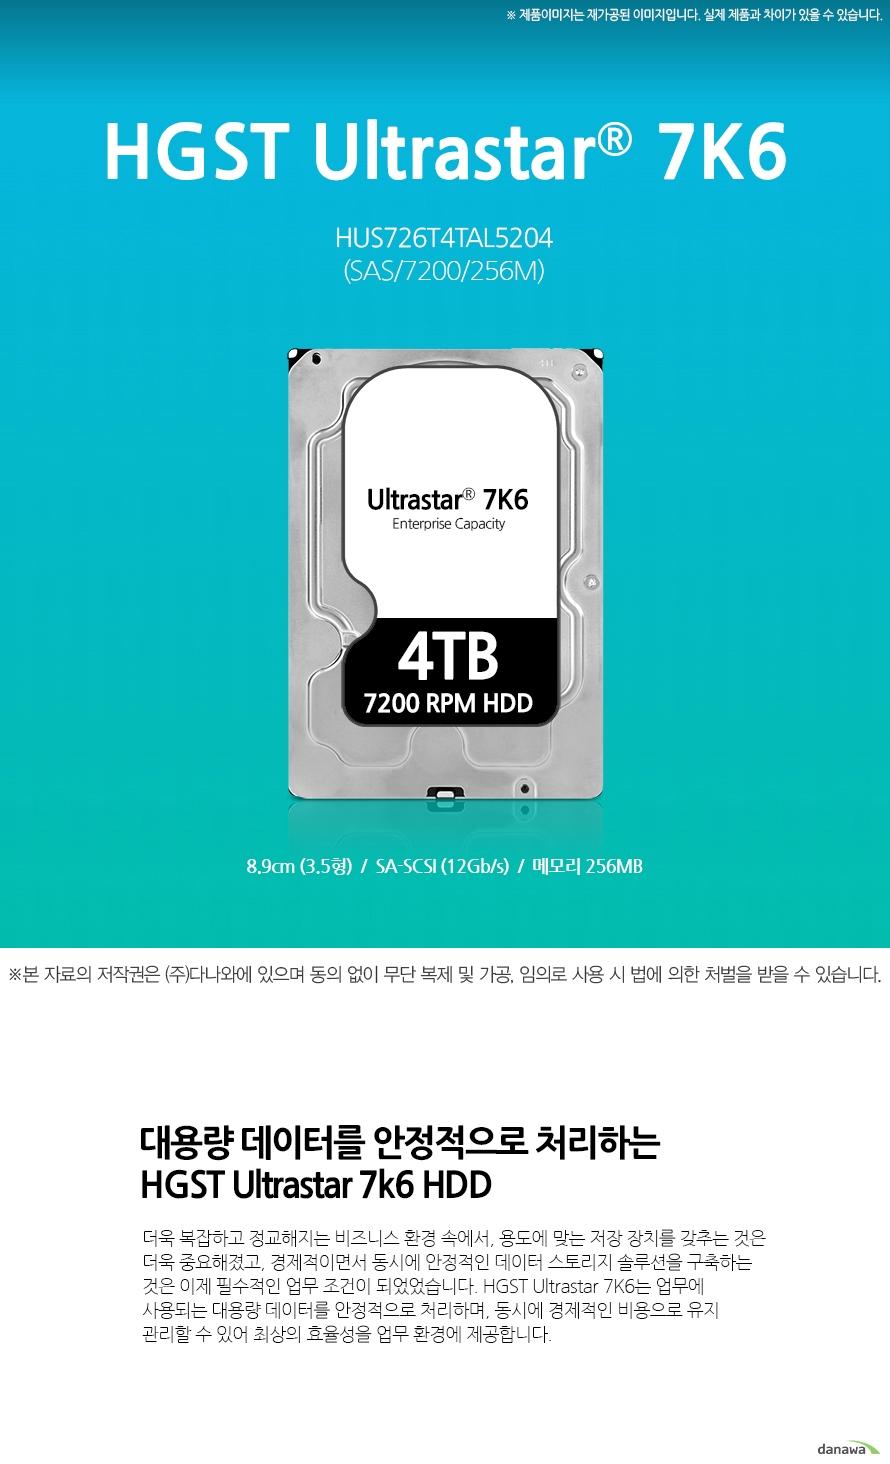 HGST 4TB Ultrastar 7K6 HUS726T4TAL5204 (SAS/7200/256M)  대용량 데이터를 안정적으로 처리하는HGST Ultrastar 7k6 HDD 더욱 복잡하고 정교해지는 비즈니스 환경 속에서, 용도에 맞는 저장 장치를 갖추는 것은 더욱 중요해졌고, 경제적이면서 동시에 안정적인 데이터 스토리지 솔루션을 구축하는 것은 이제 필수적인 업무 조건이 되었었습니다. HGST Ultrastar 7K6는 업무에 사용되는 대용량 데이터를 안정적으로 처리하며, 동시에 경제적인 비용으로 유지 관리할 수 있어 최상의 효율성을 업무 환경에 제공합니다.   고성능 대용량 저비용 대용량 경제적인 비용으로 넓은 용량의 스토리지 환경을 구축할 수 있습니다. 뛰어난 퍼포먼스 최대 7200 RPM의 회전수로 신속하게 데이터에 접속하고, 버퍼 용량 255MB/s로 데이터를 빠르게 전송합니다.  용도에 맞는 사용 SAS 방식으로써, 업무 용도에 맞추어 서버용, 저장용으로 모두 사용 가능합니다.  성능 대용량으로 업무에 필요한 다양한 데이터 저장 용도에 맞게 서버용으로 사용 버퍼 용량 255MB/s로 데이터를 빠르게 전송  넓은 저장 공간 많은 양의 데이터를 보관할 수 있는 4TB의 넓은 저장 공간 전송 속도 데이터를 빠르게 처리하는 255MB/s의 안정적인 전송율 안정성 Enterprise급 뛰어난 안전성